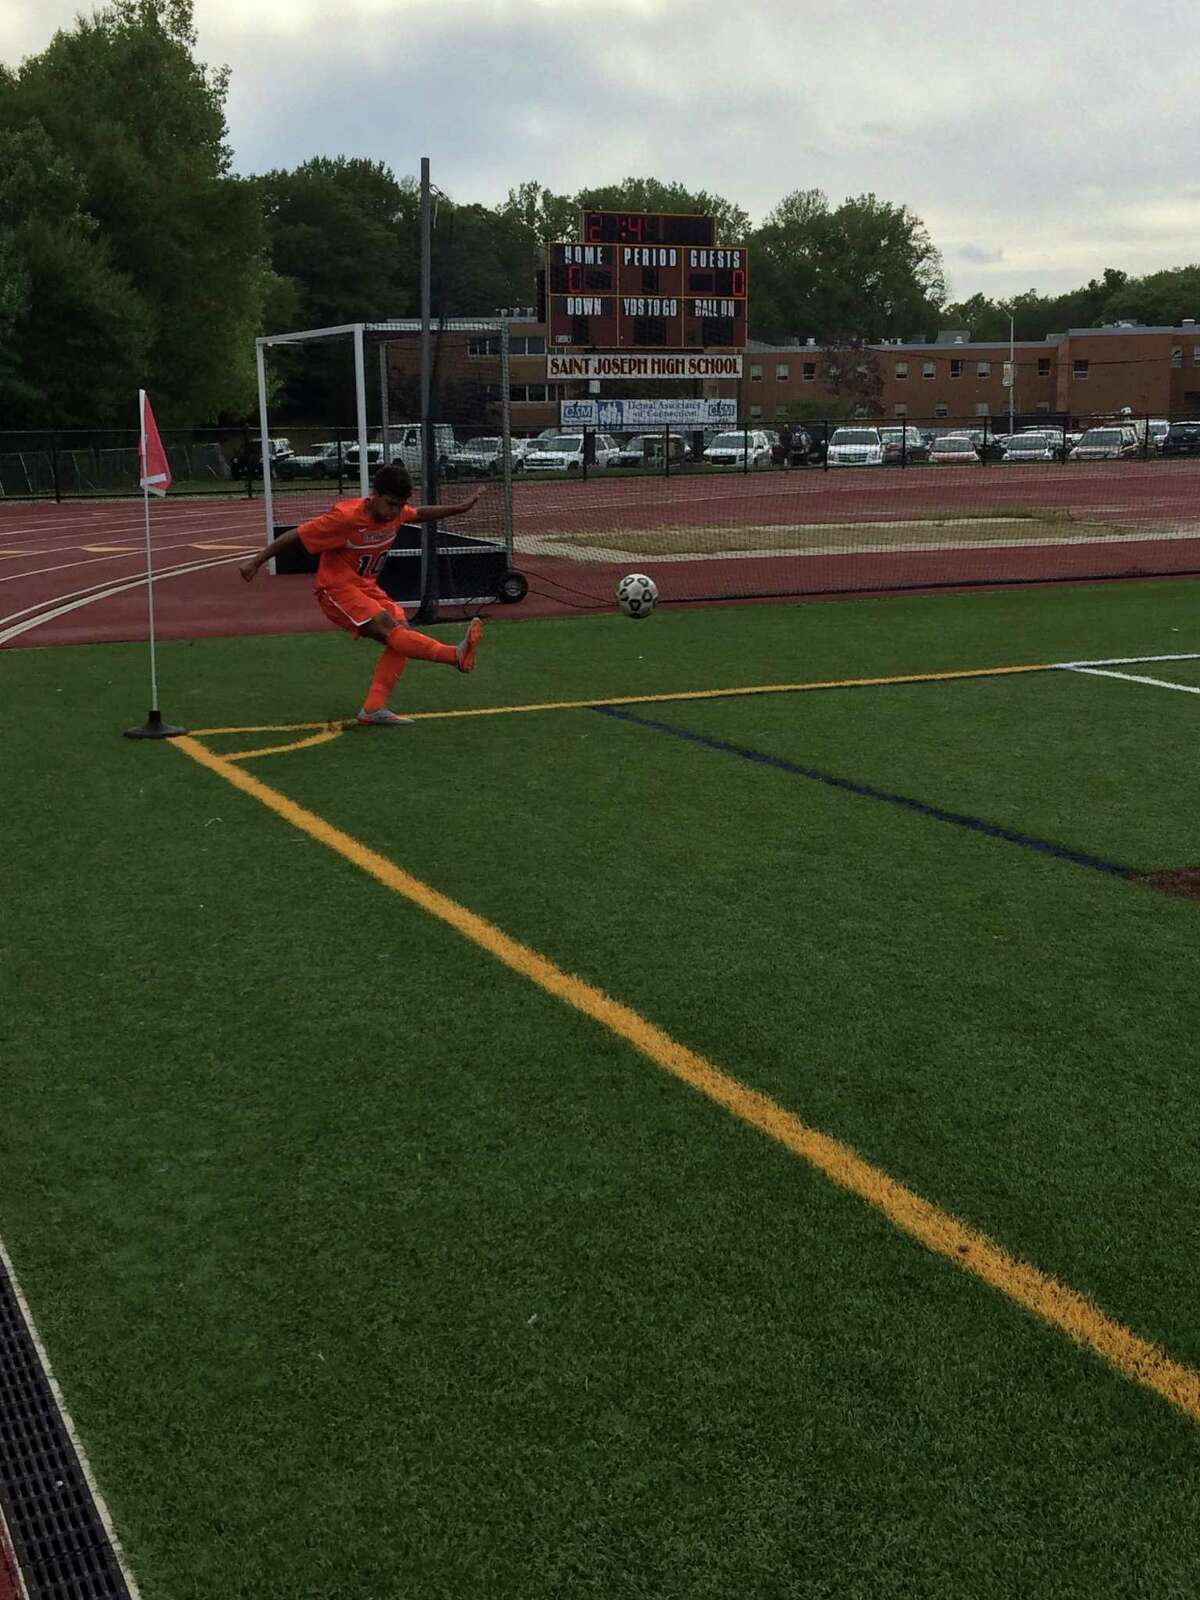 Danbury forward Edwin Rosano attempts a corner kick against St. Joseph on Tuesday in Trumbull.